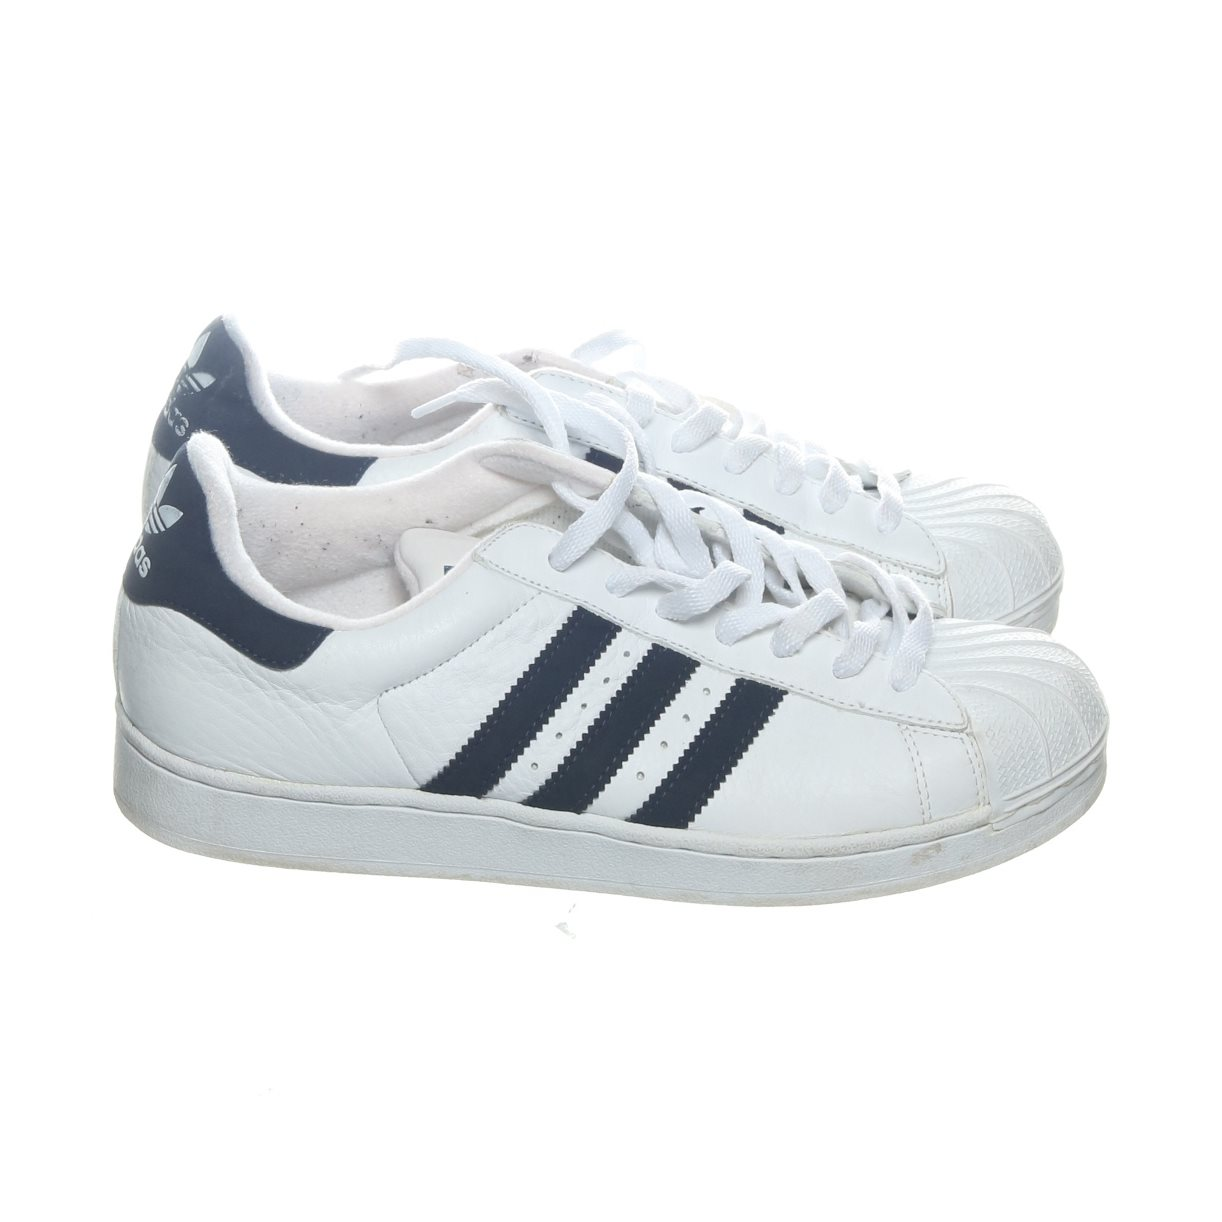 the latest 51dde 75a8c Adidas, Sneakers, Strl 42.5, Stan Smith, SvartVit